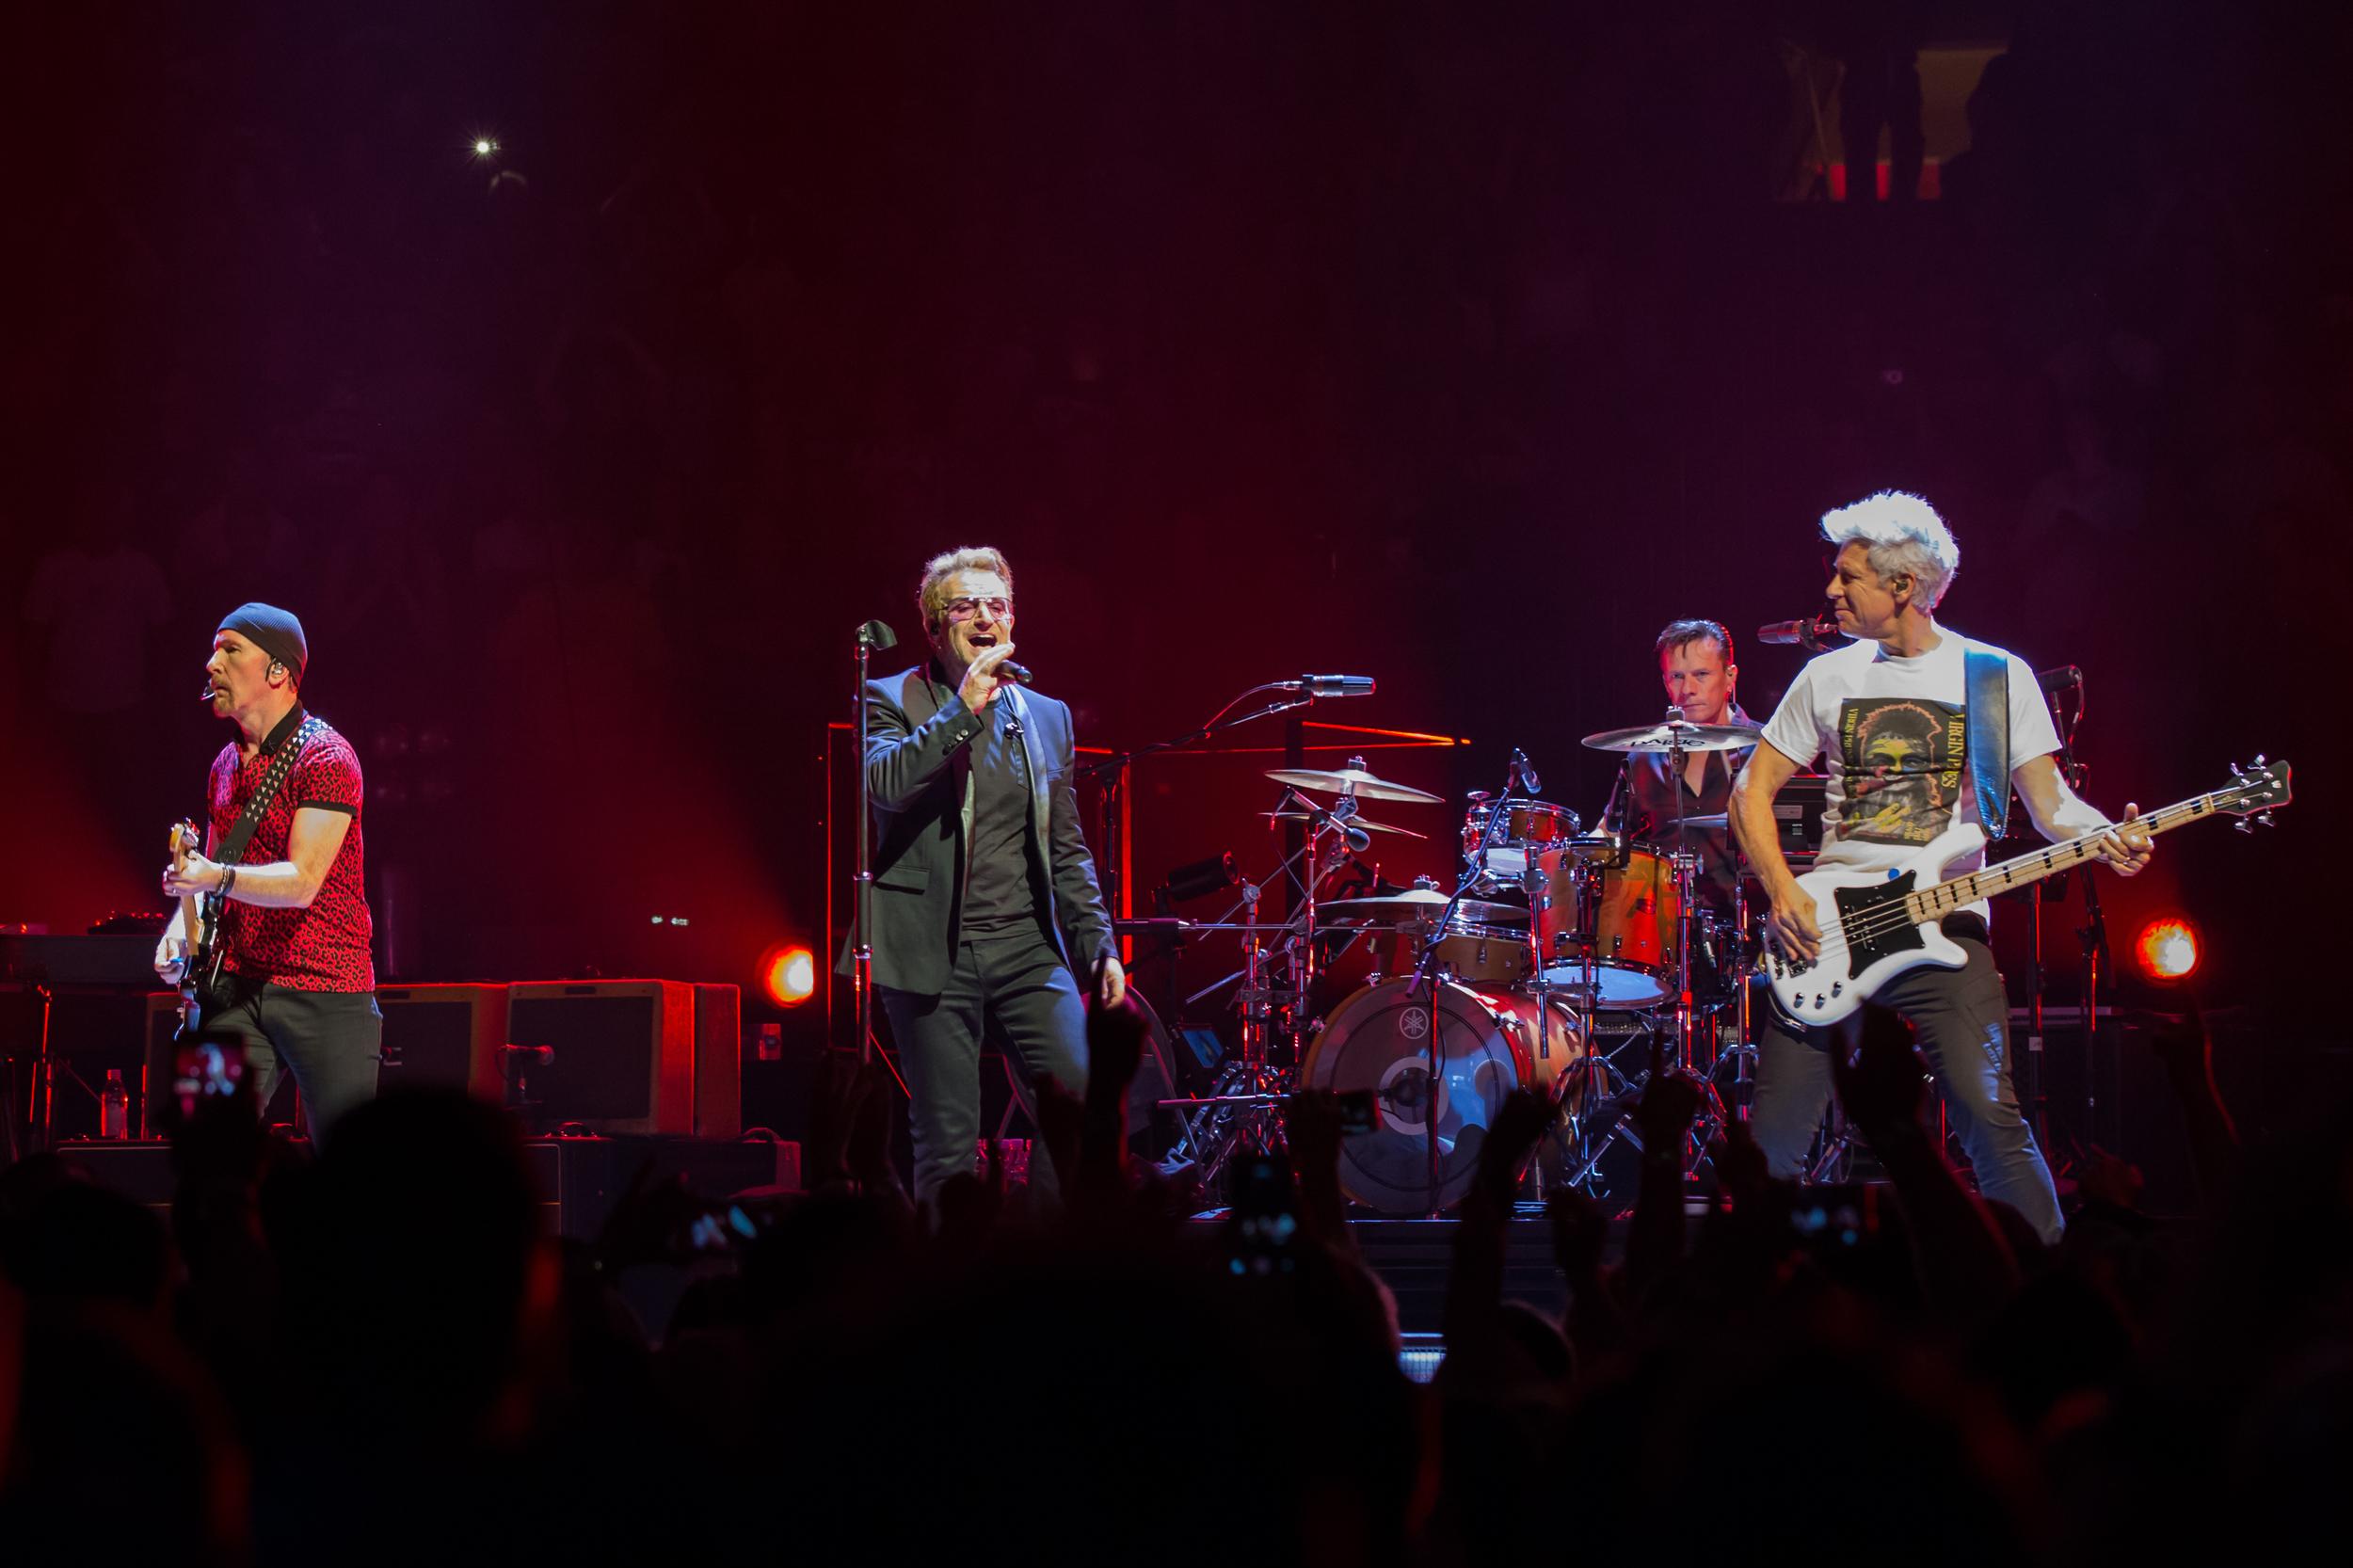 U2 / Mark Peterson / U2Tourfans